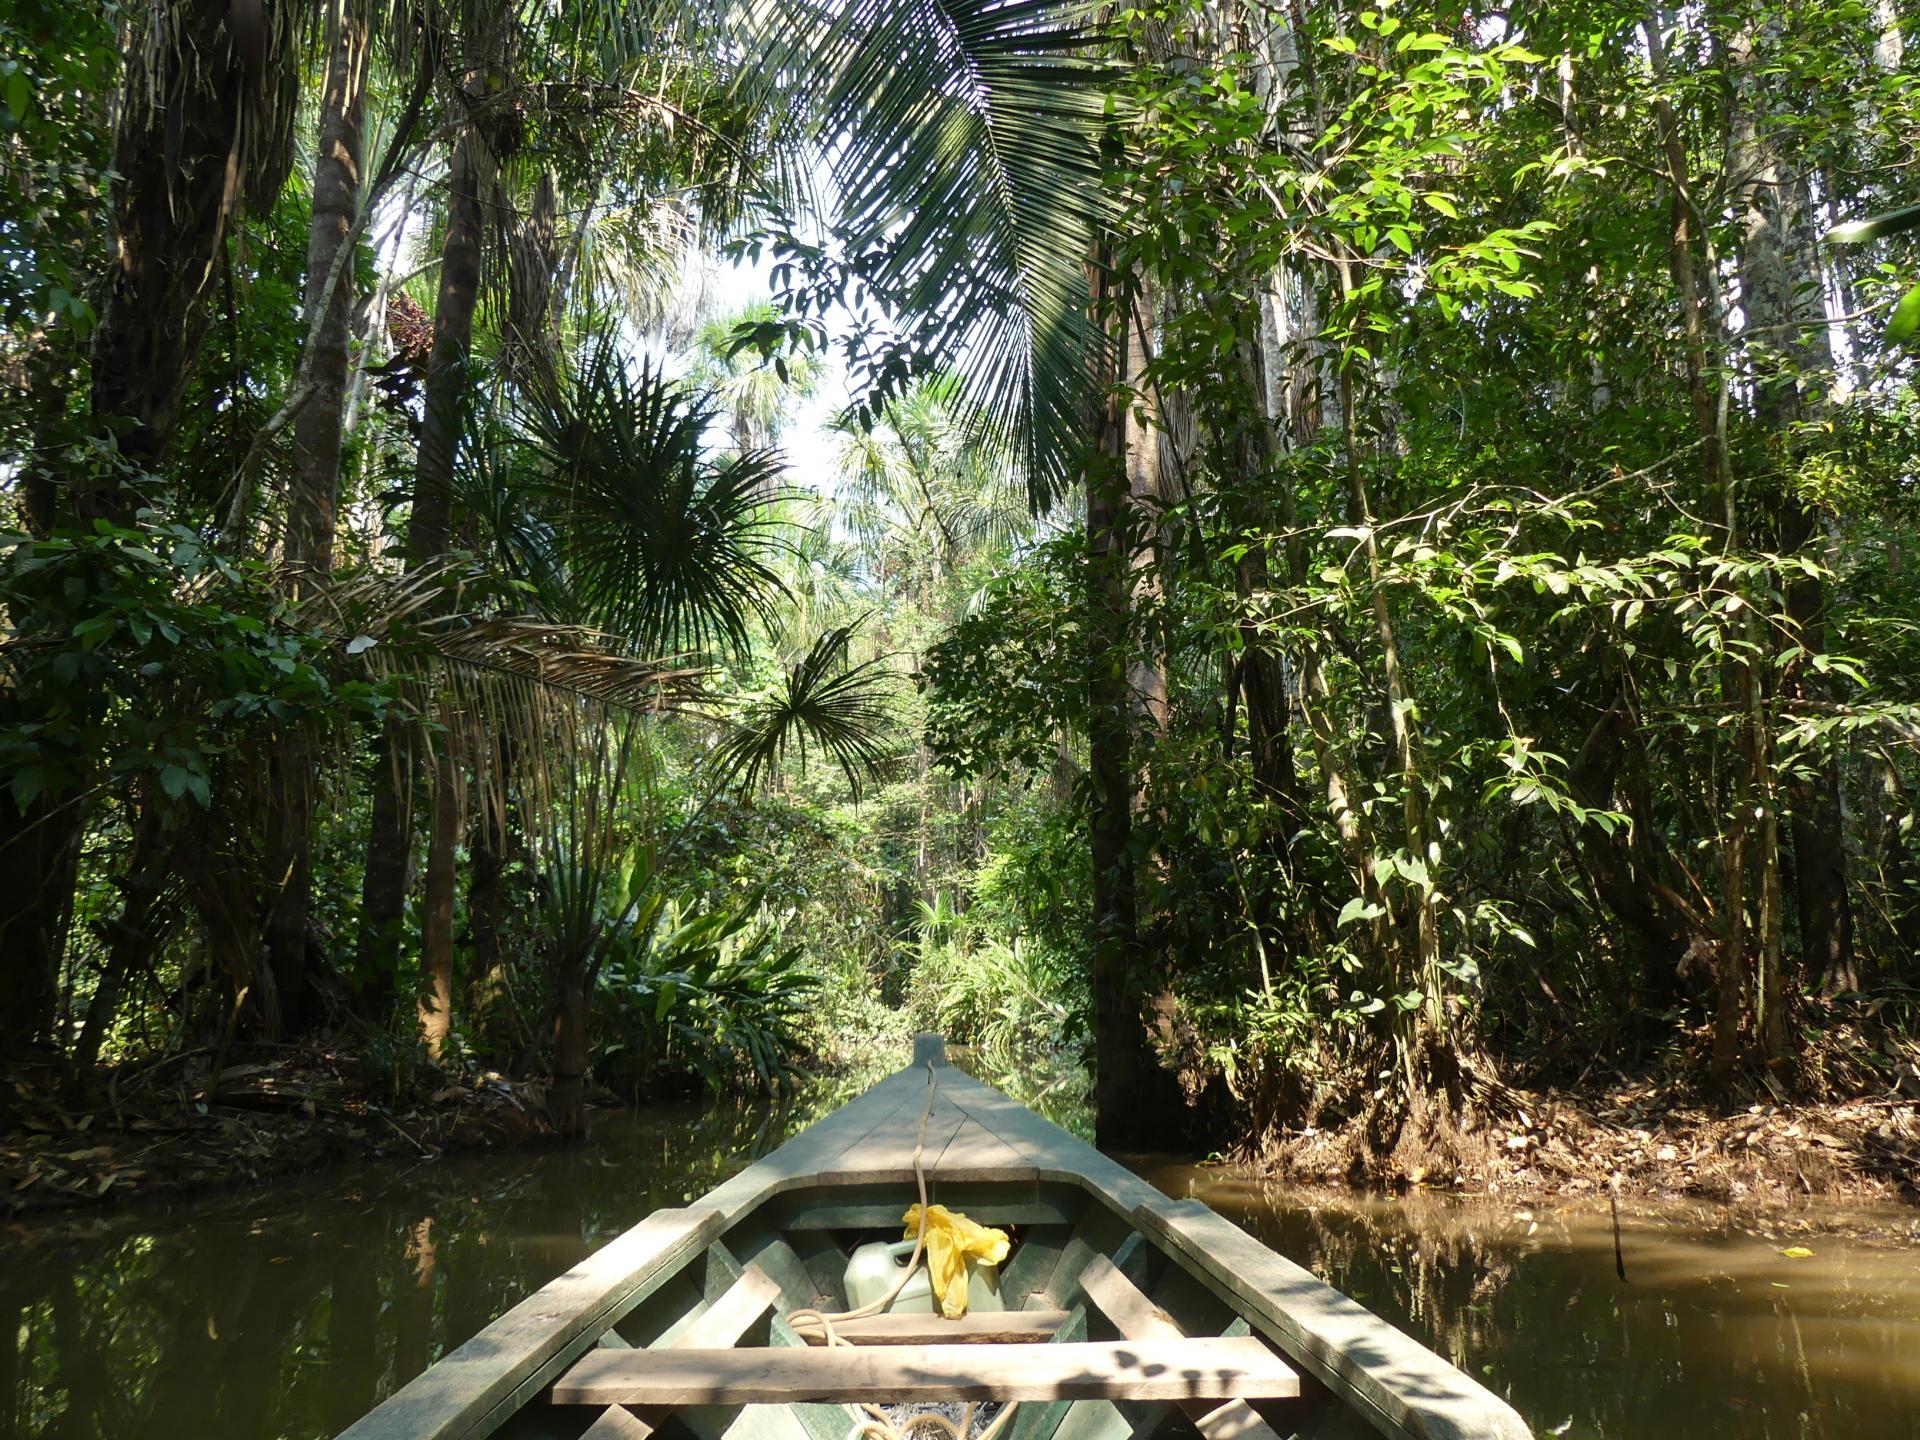 Amazonie bateau foret